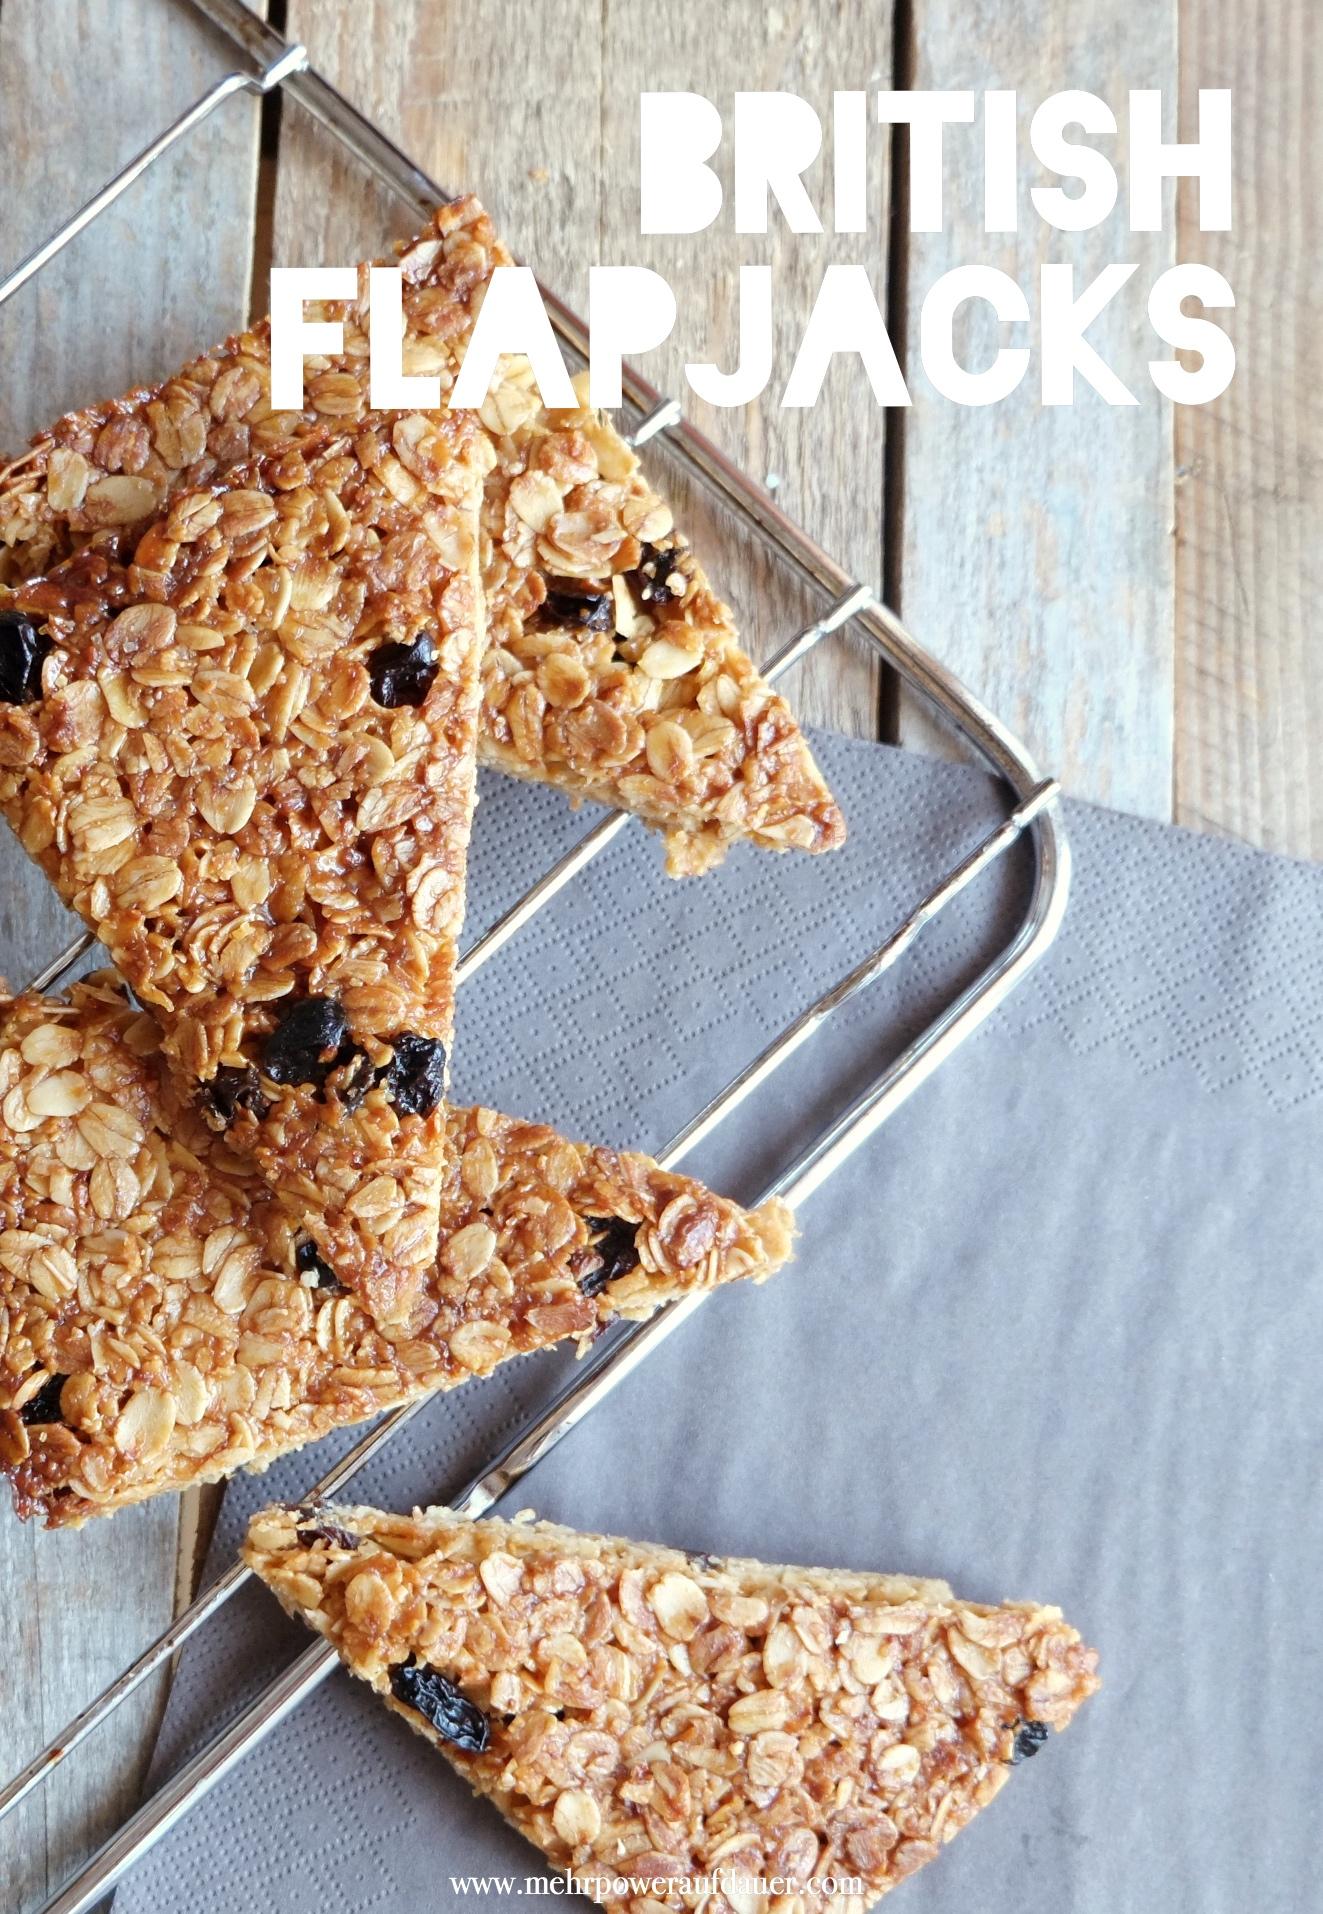 Flapjacks @ mehrpoweraufdauer.com